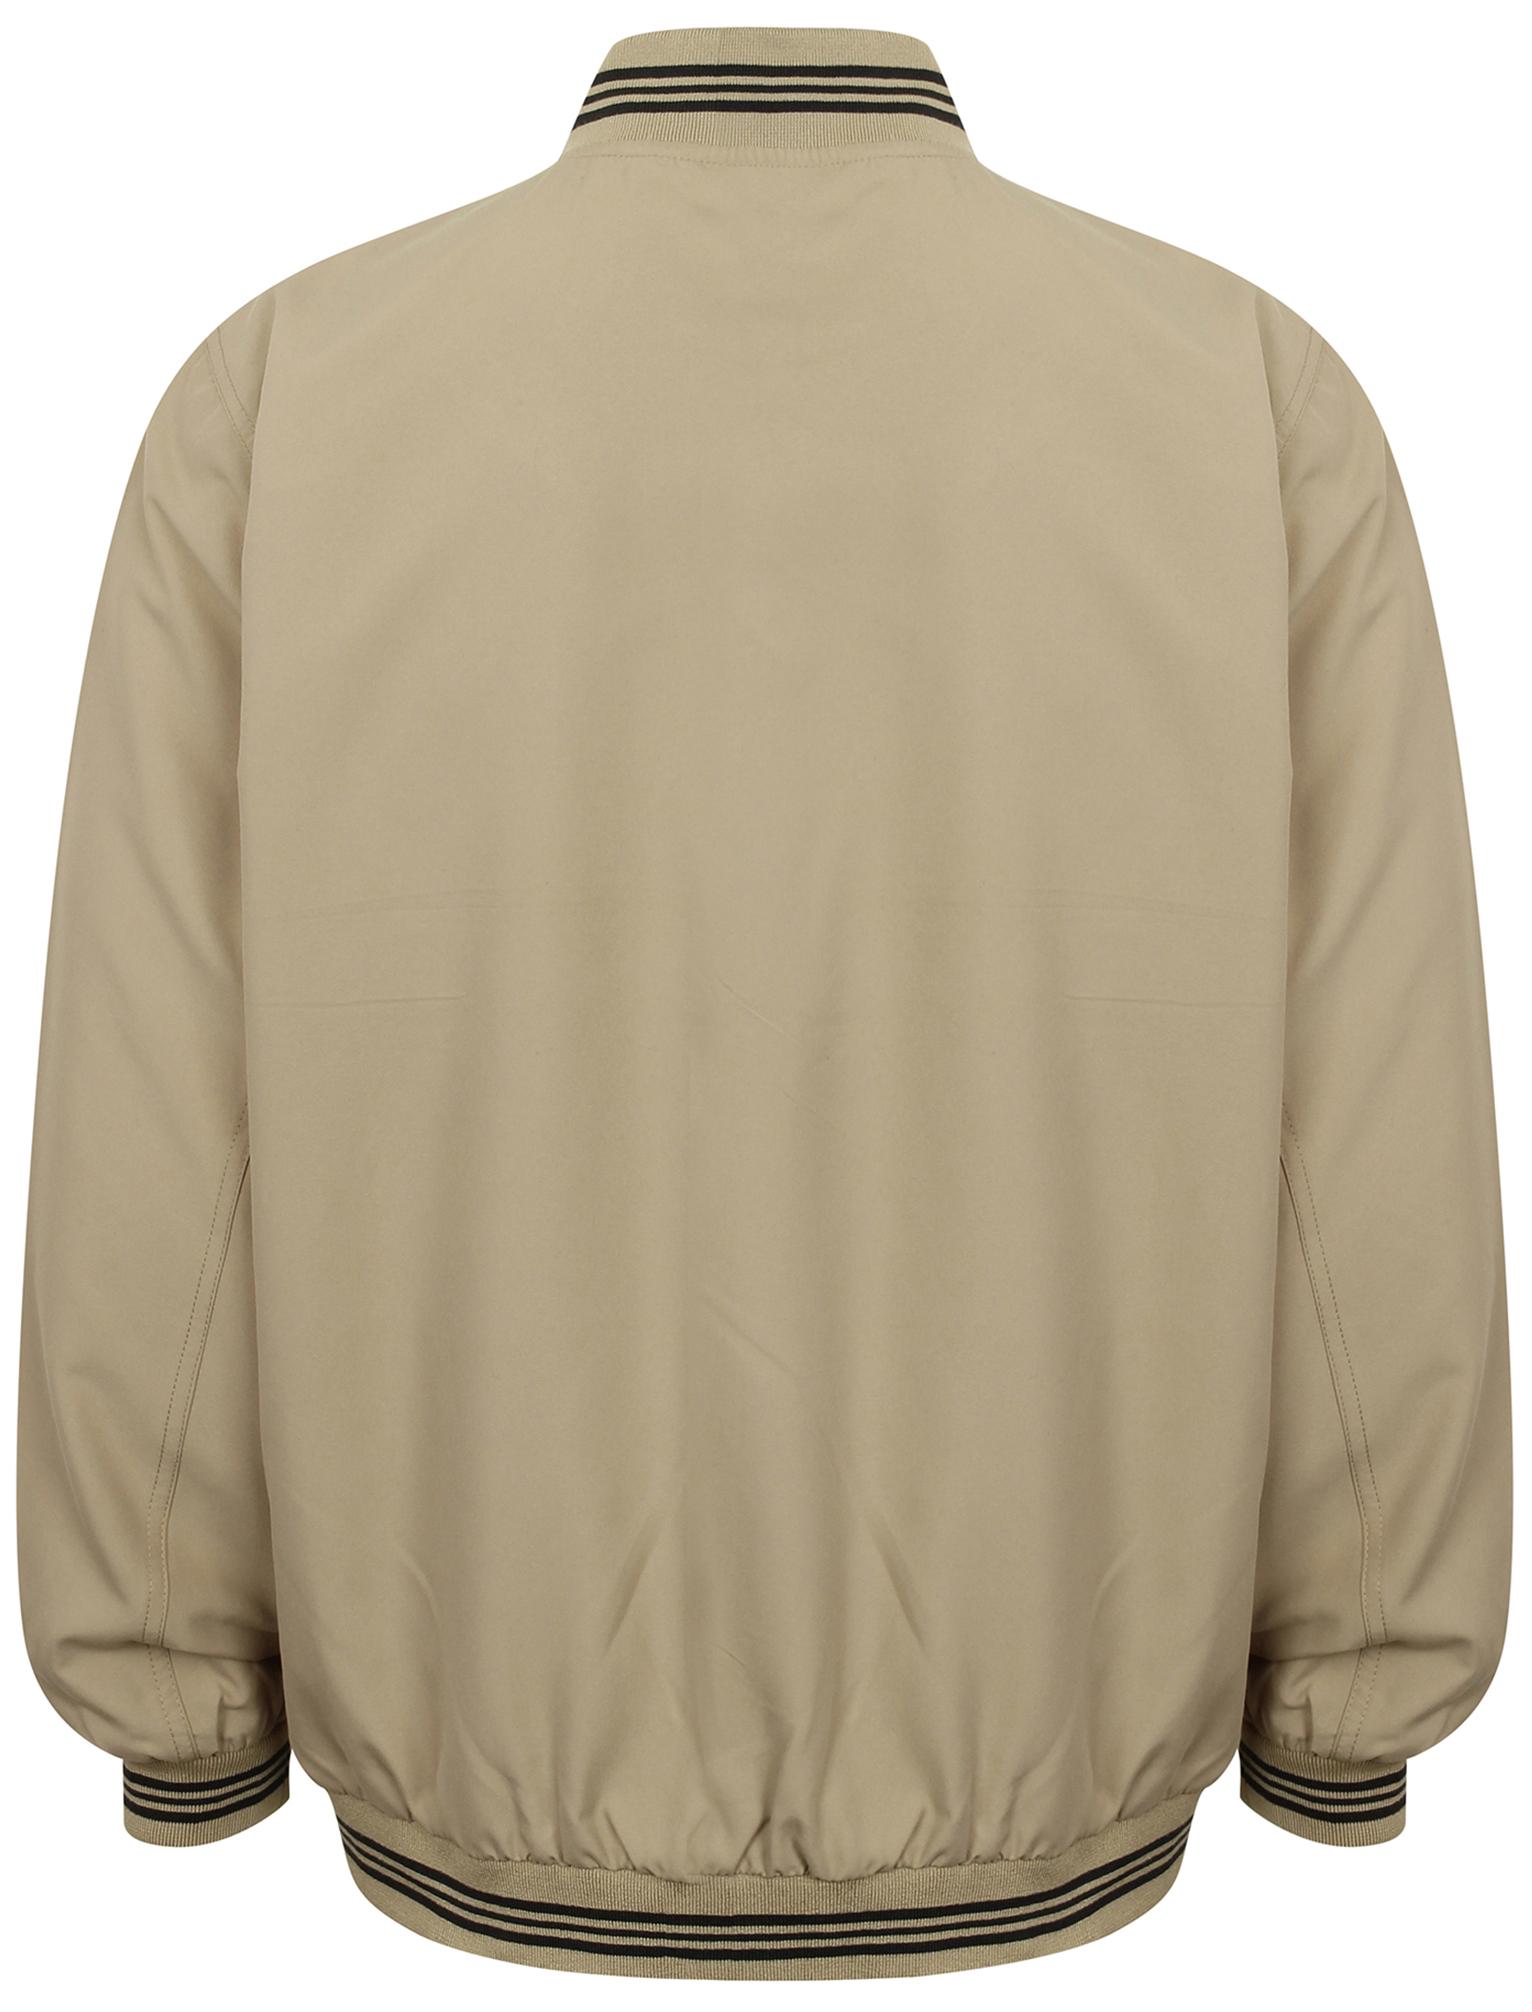 tokyo hot  e756 Men-Kensington-Eastside-Ribbed-Detail-Bomber-Jacket-By-